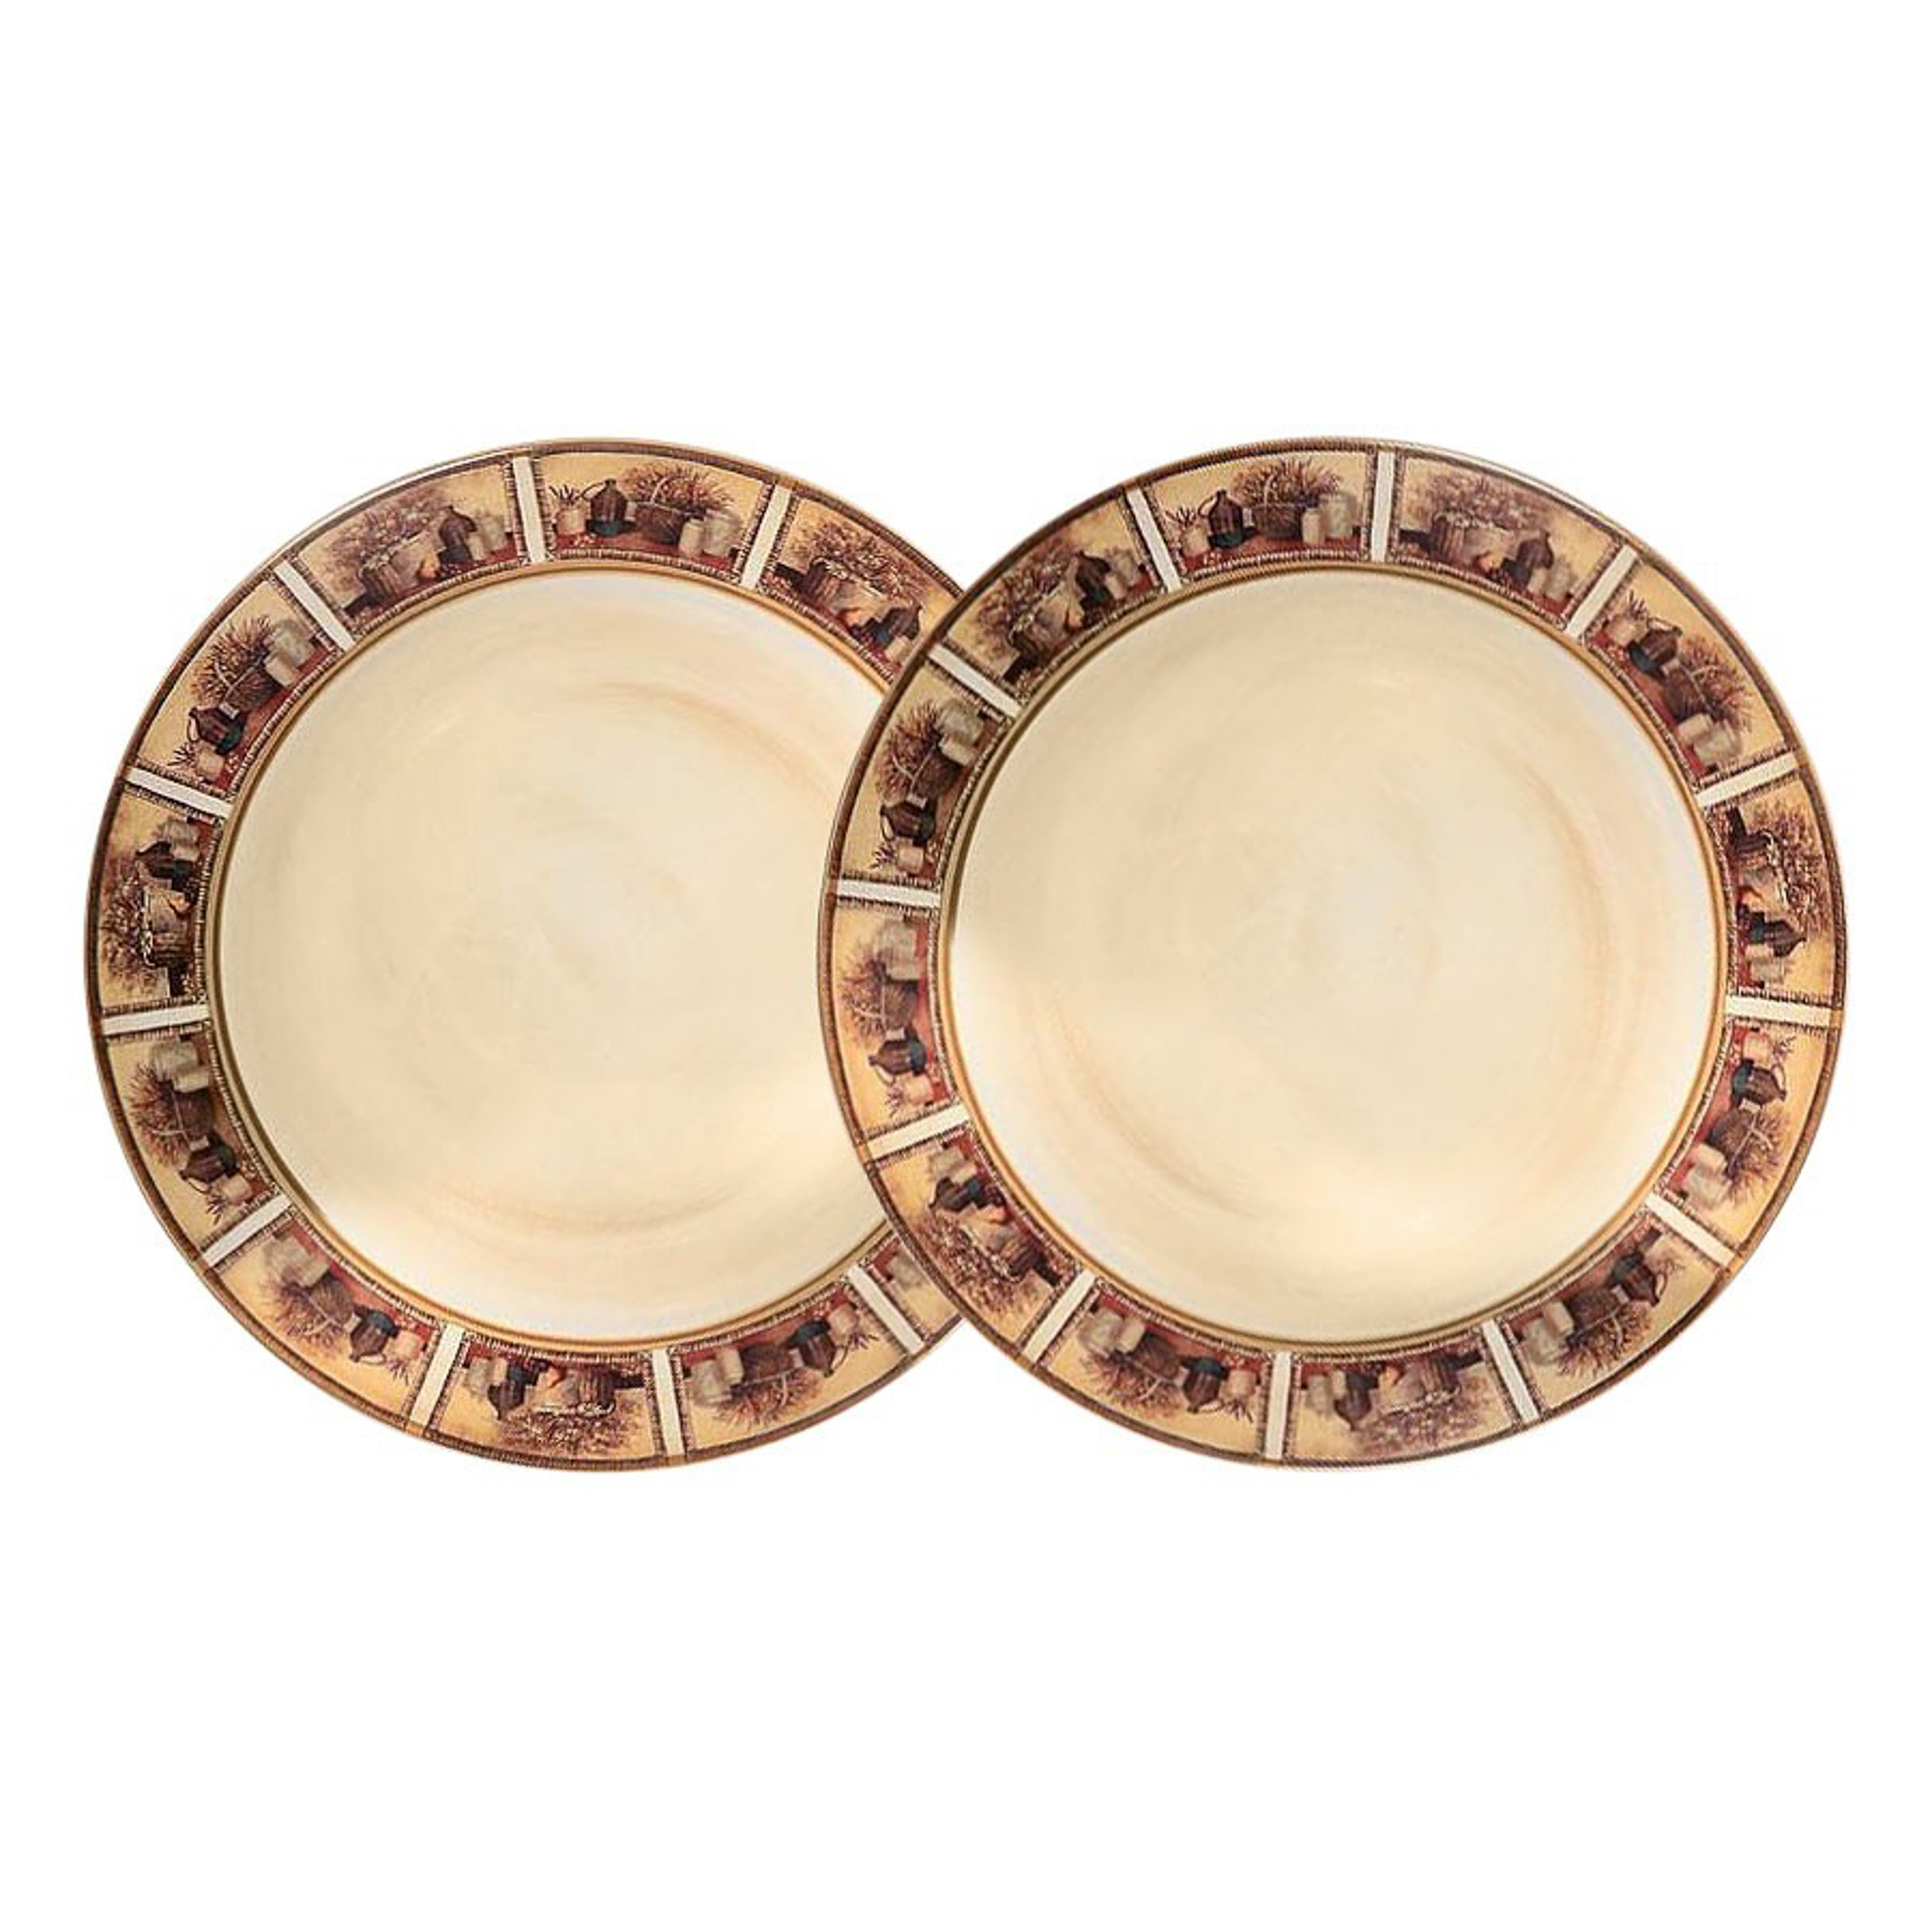 Набор тарелок десертных LCS Натюрморт 2 шт